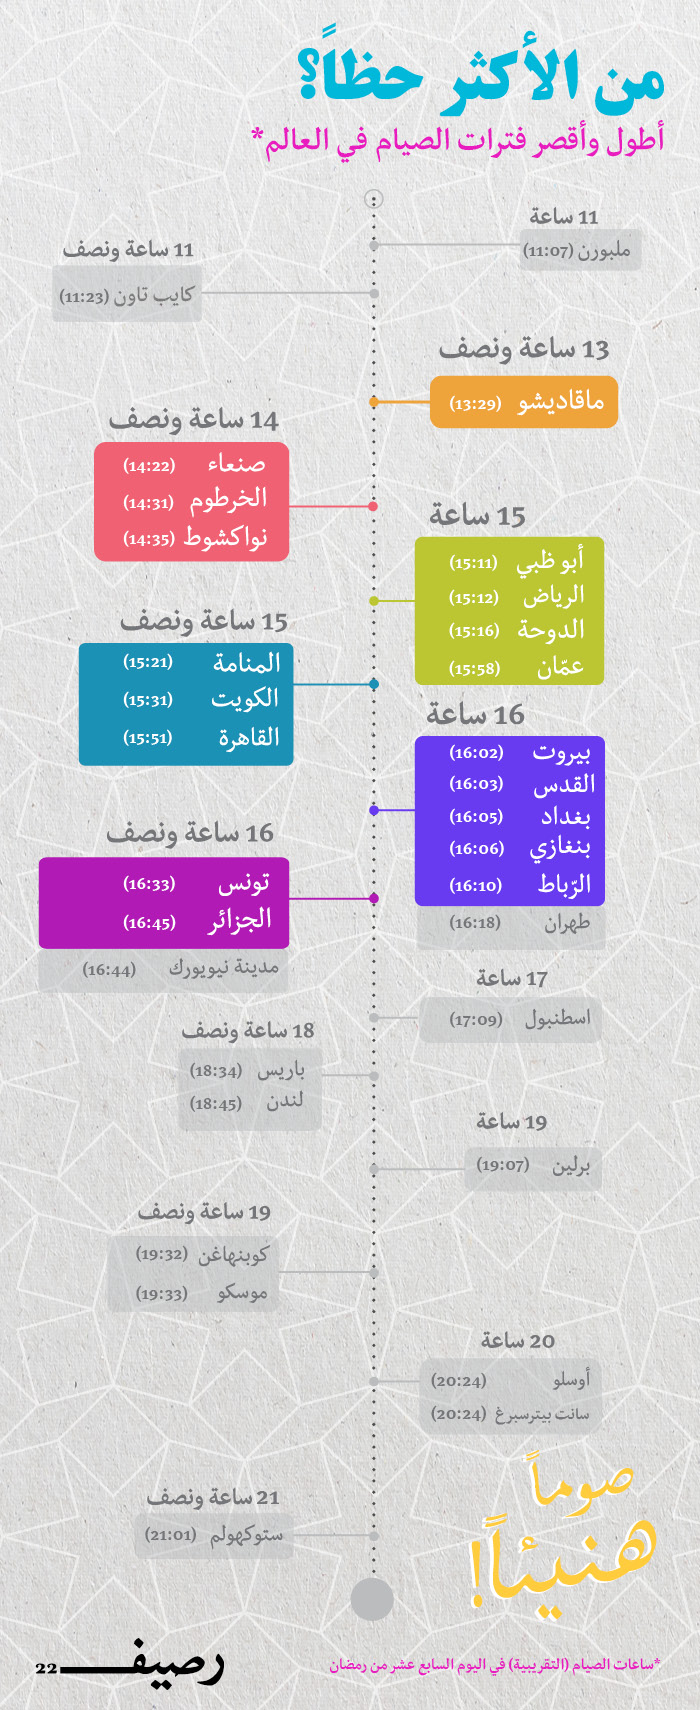 MAIN Ramadan Fasting Hours 2016